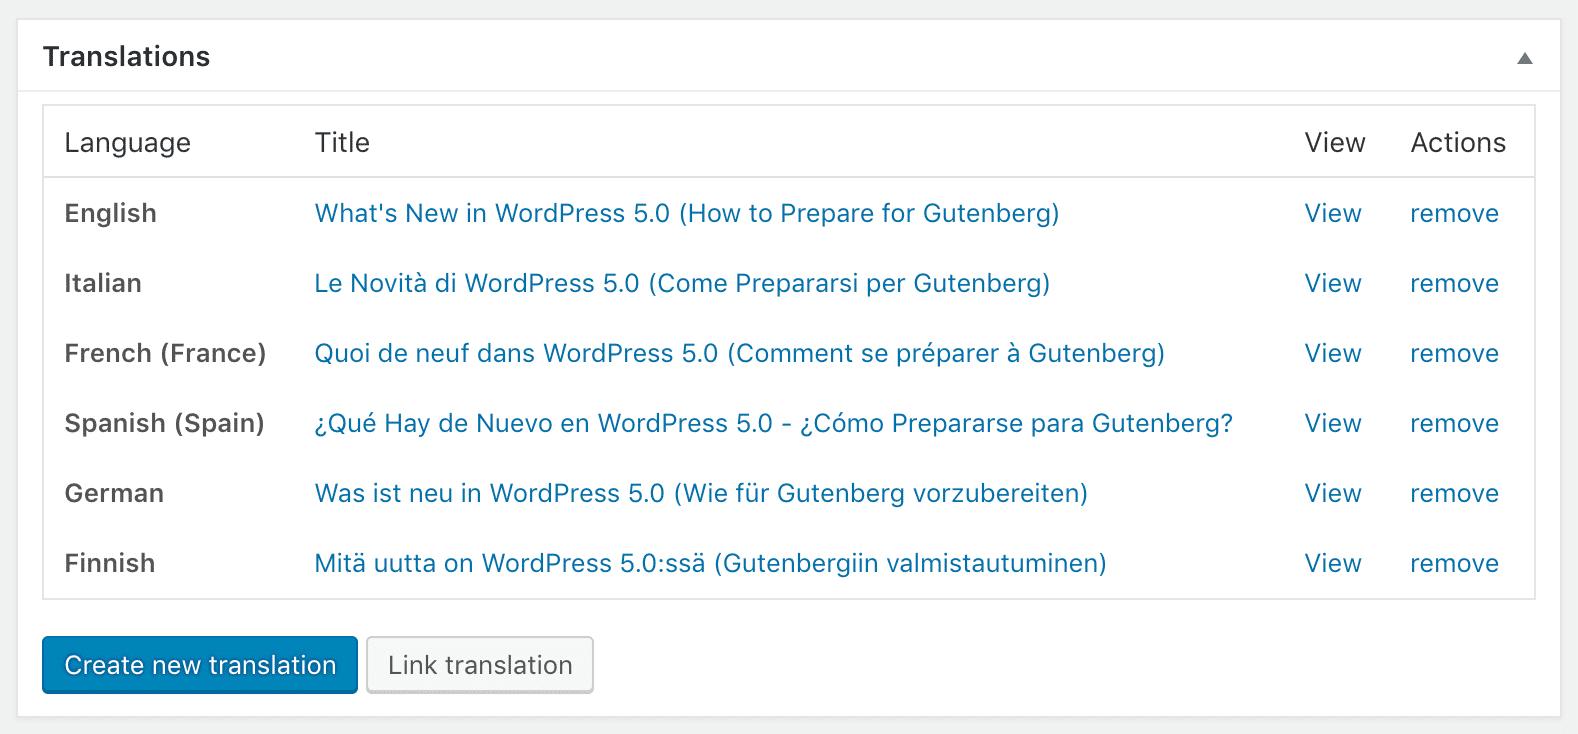 Vinculando traduções no WordPress